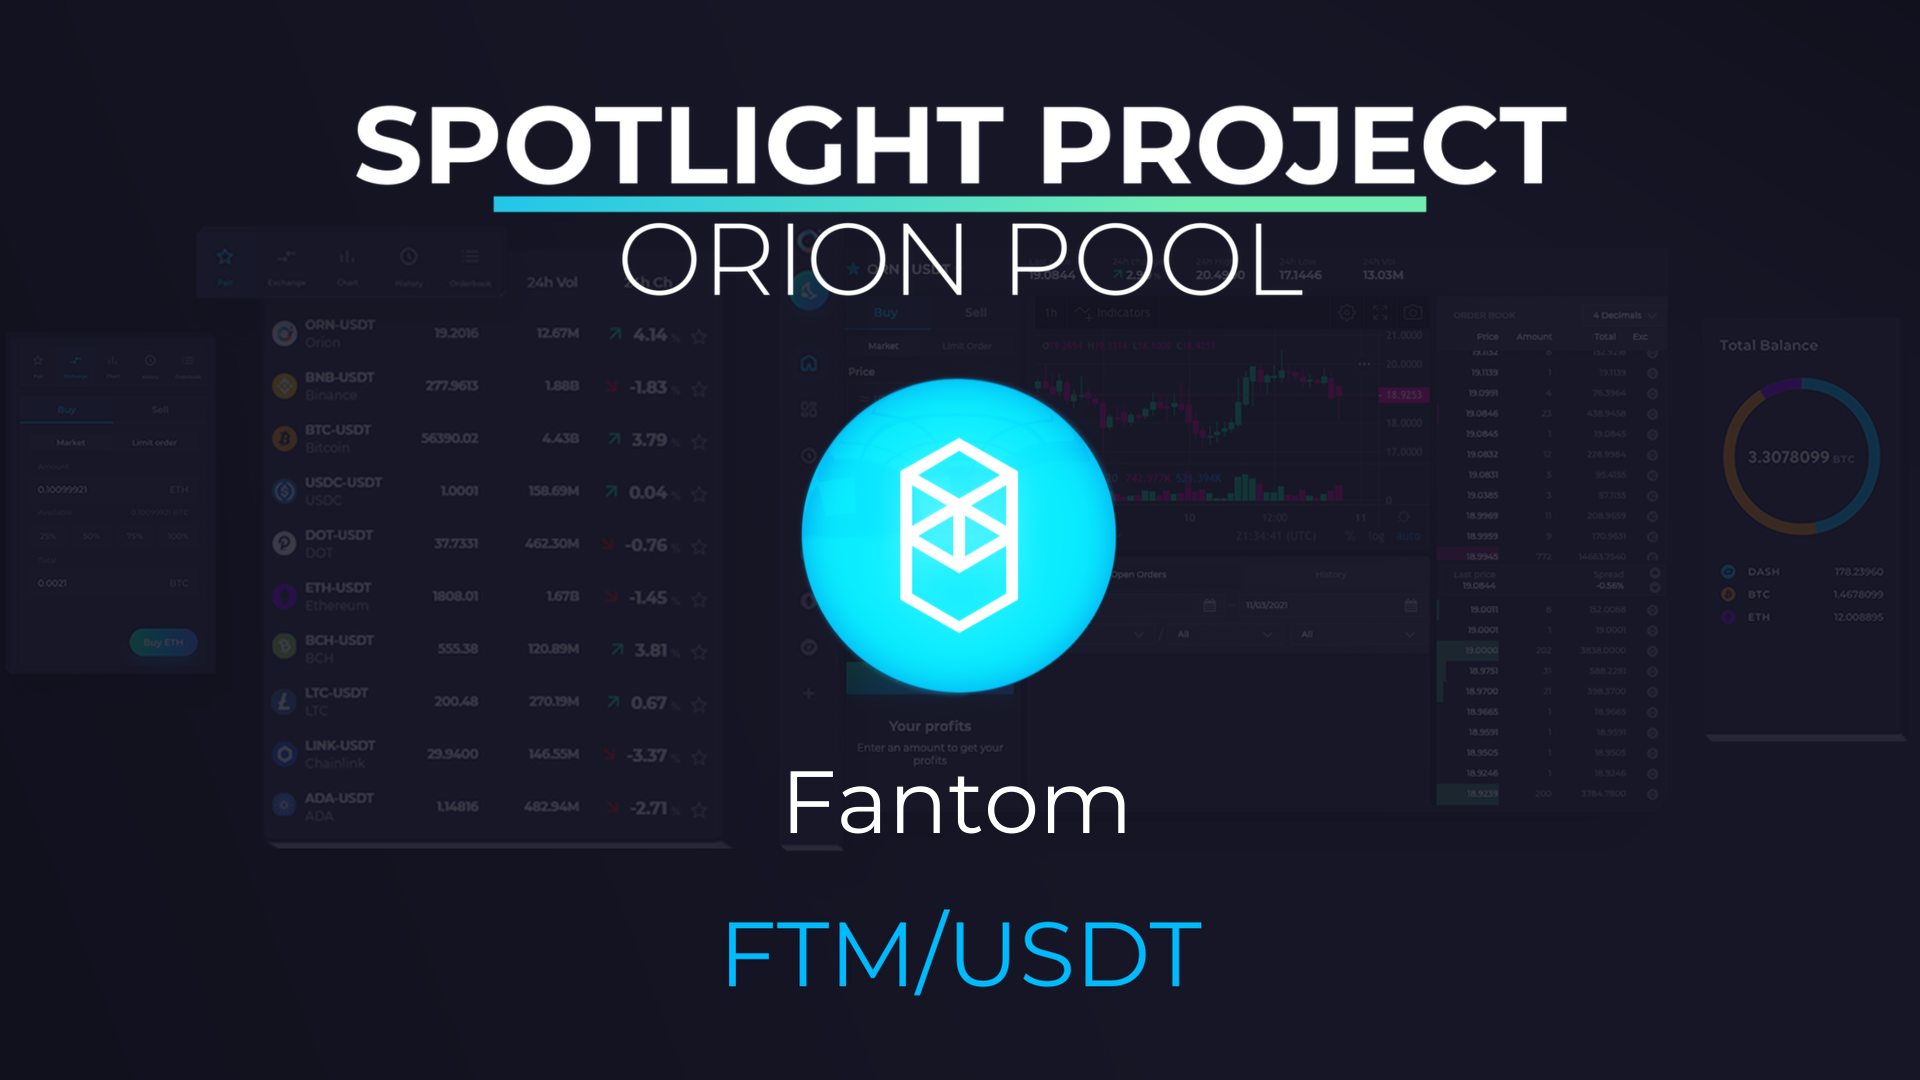 Fantom: the first Spotlight on Orion Pool